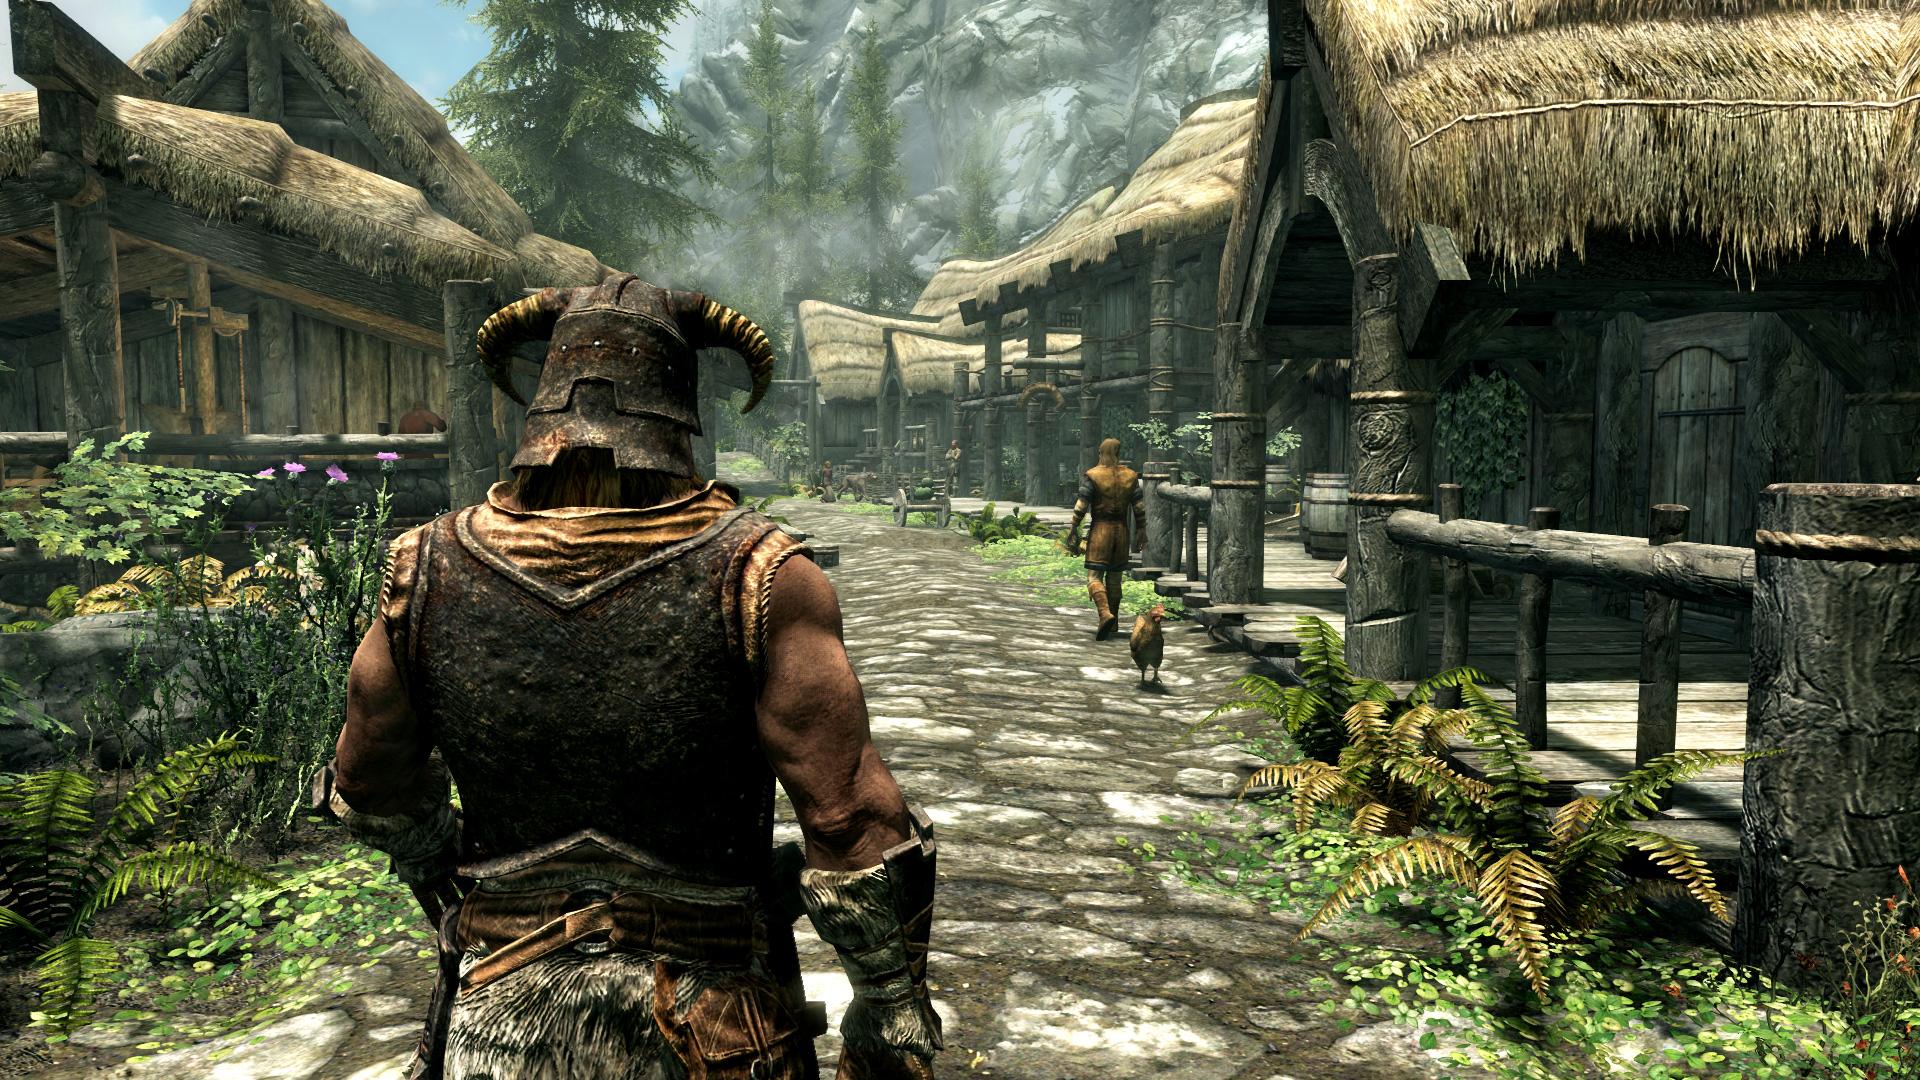 Save 60% on The Elder Scrolls V: Skyrim Special Edition on Steam